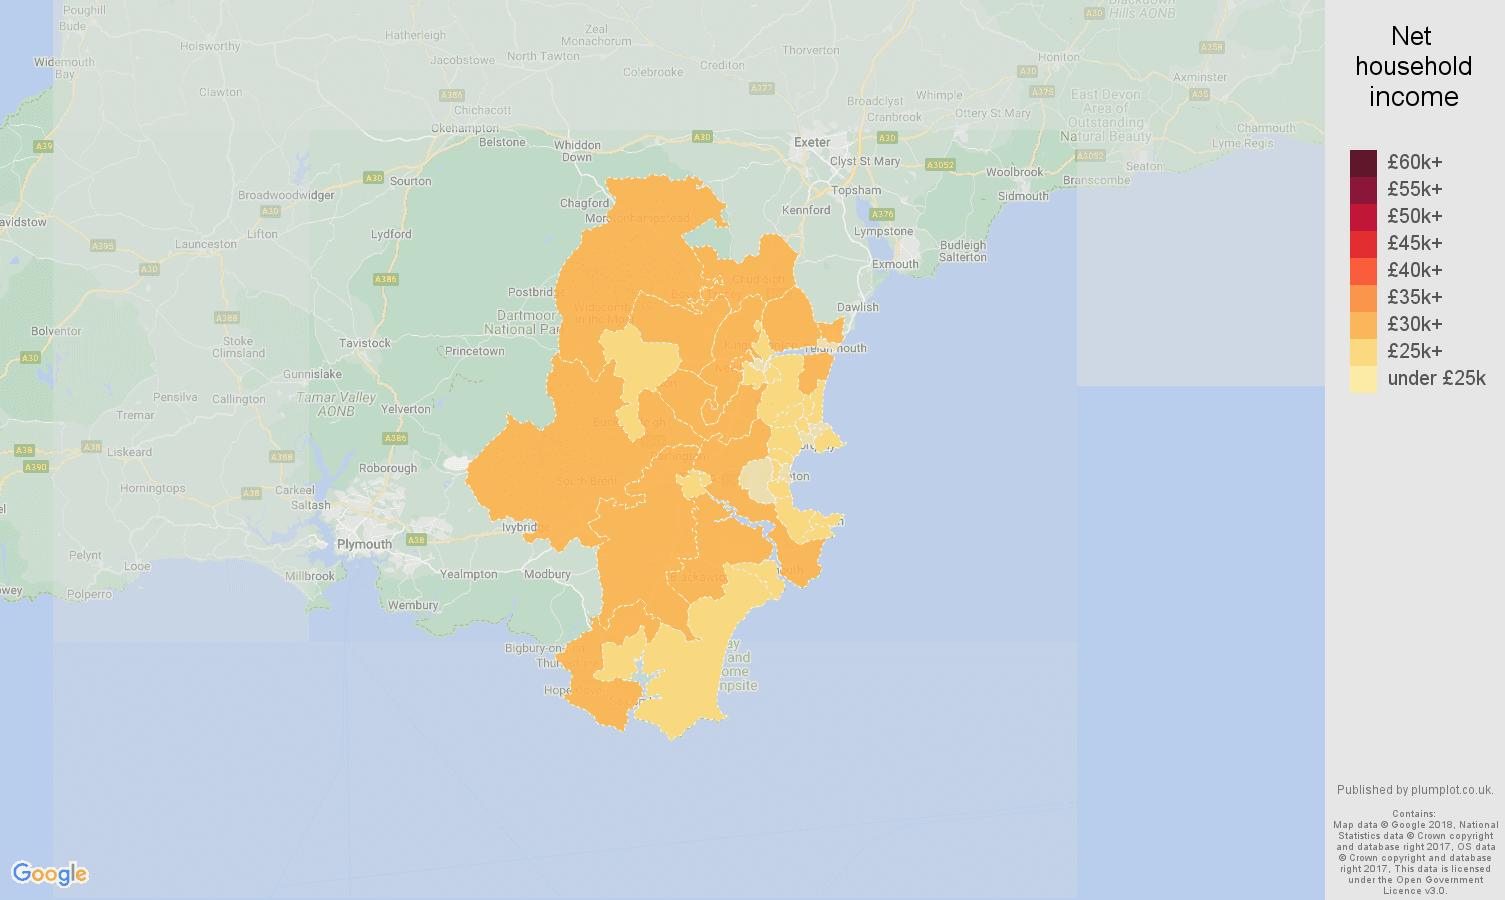 Torquay net household income map